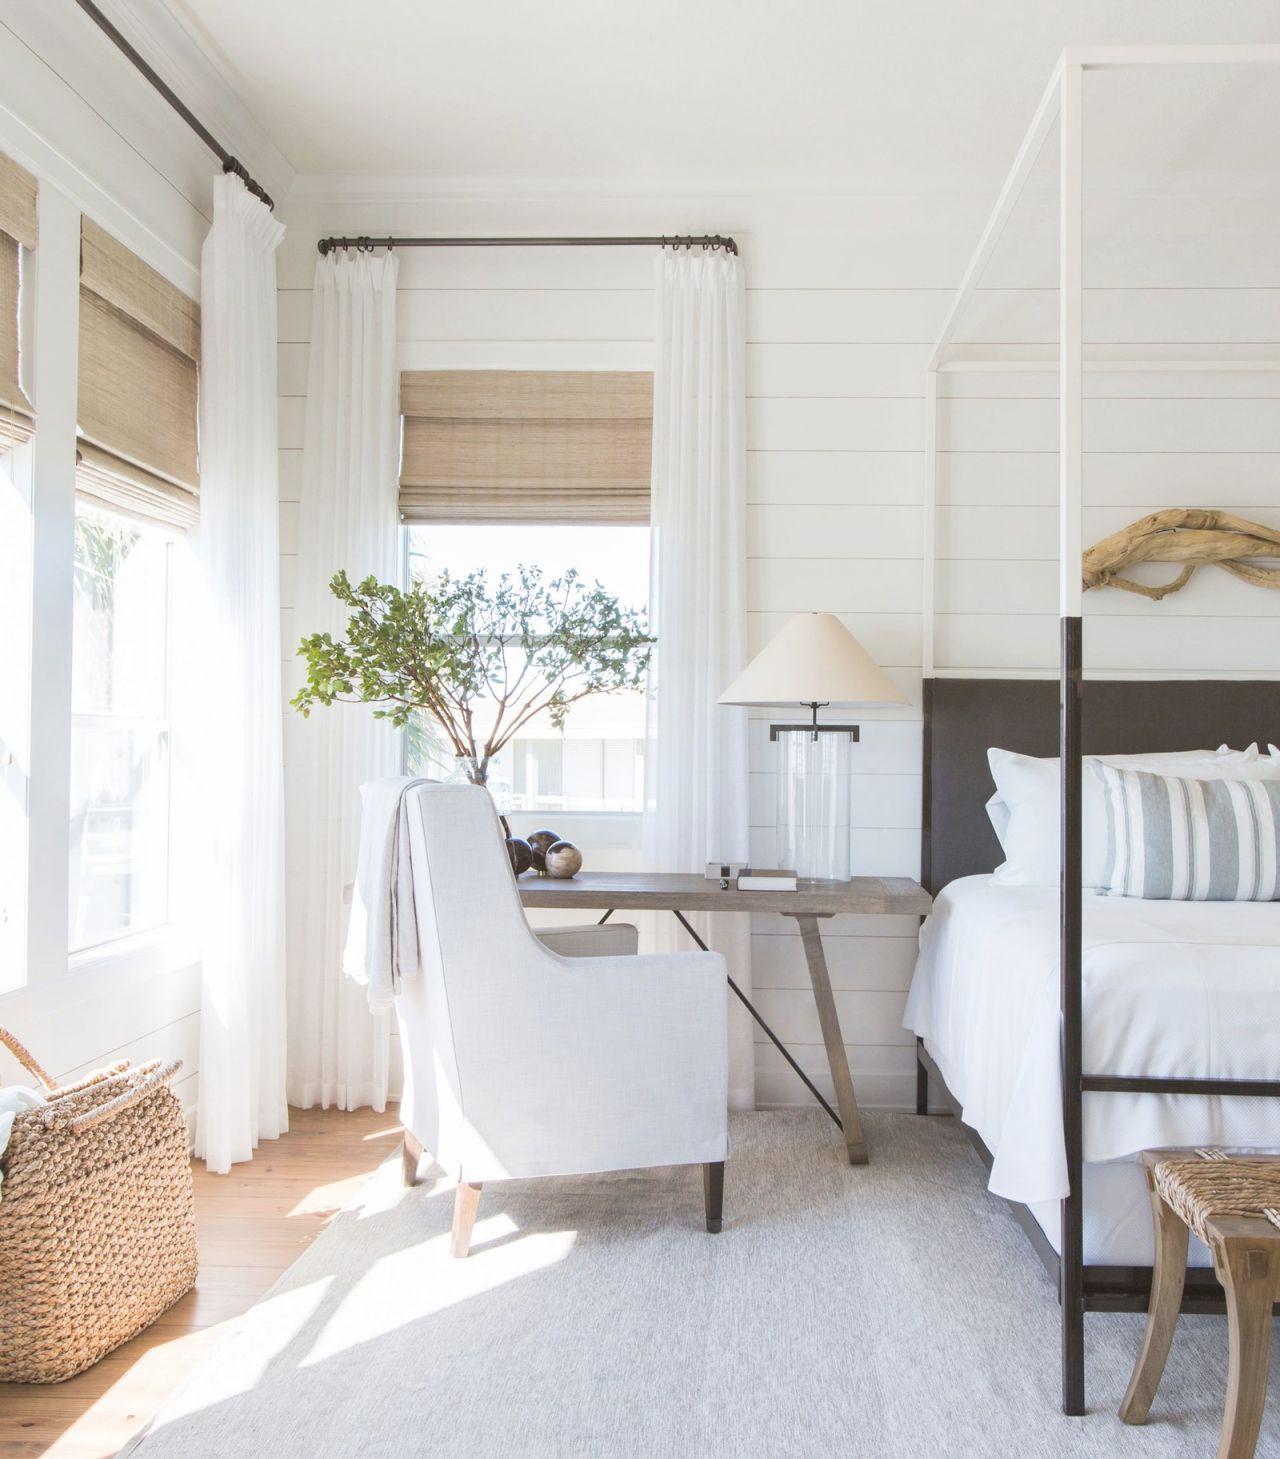 15 Master Bedroom Decorating Ideas And Design Inspiration pertaining to Elegant Cheap Bedroom Decor Ideas